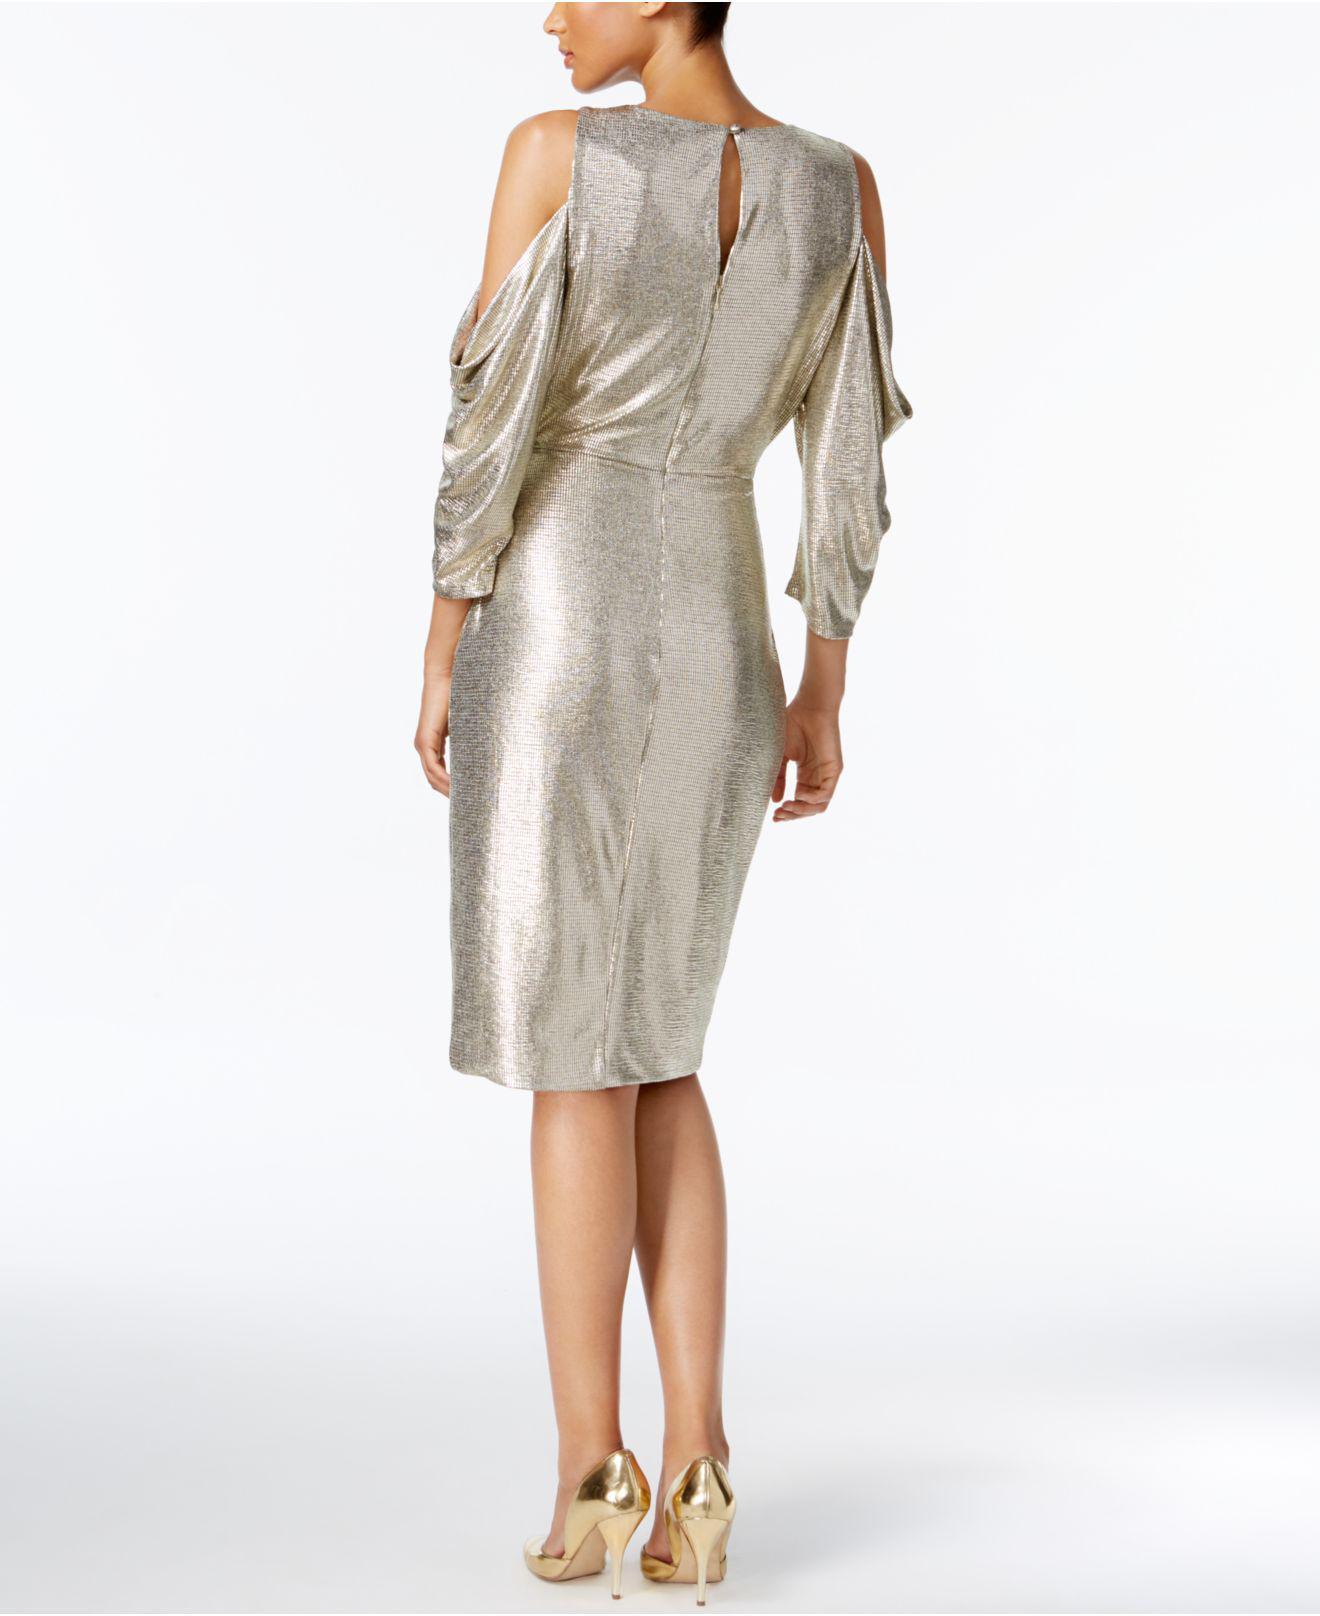 Rachel Roy Cold Shoulder Metallic Wrap Dress Lyst View Fullscreen